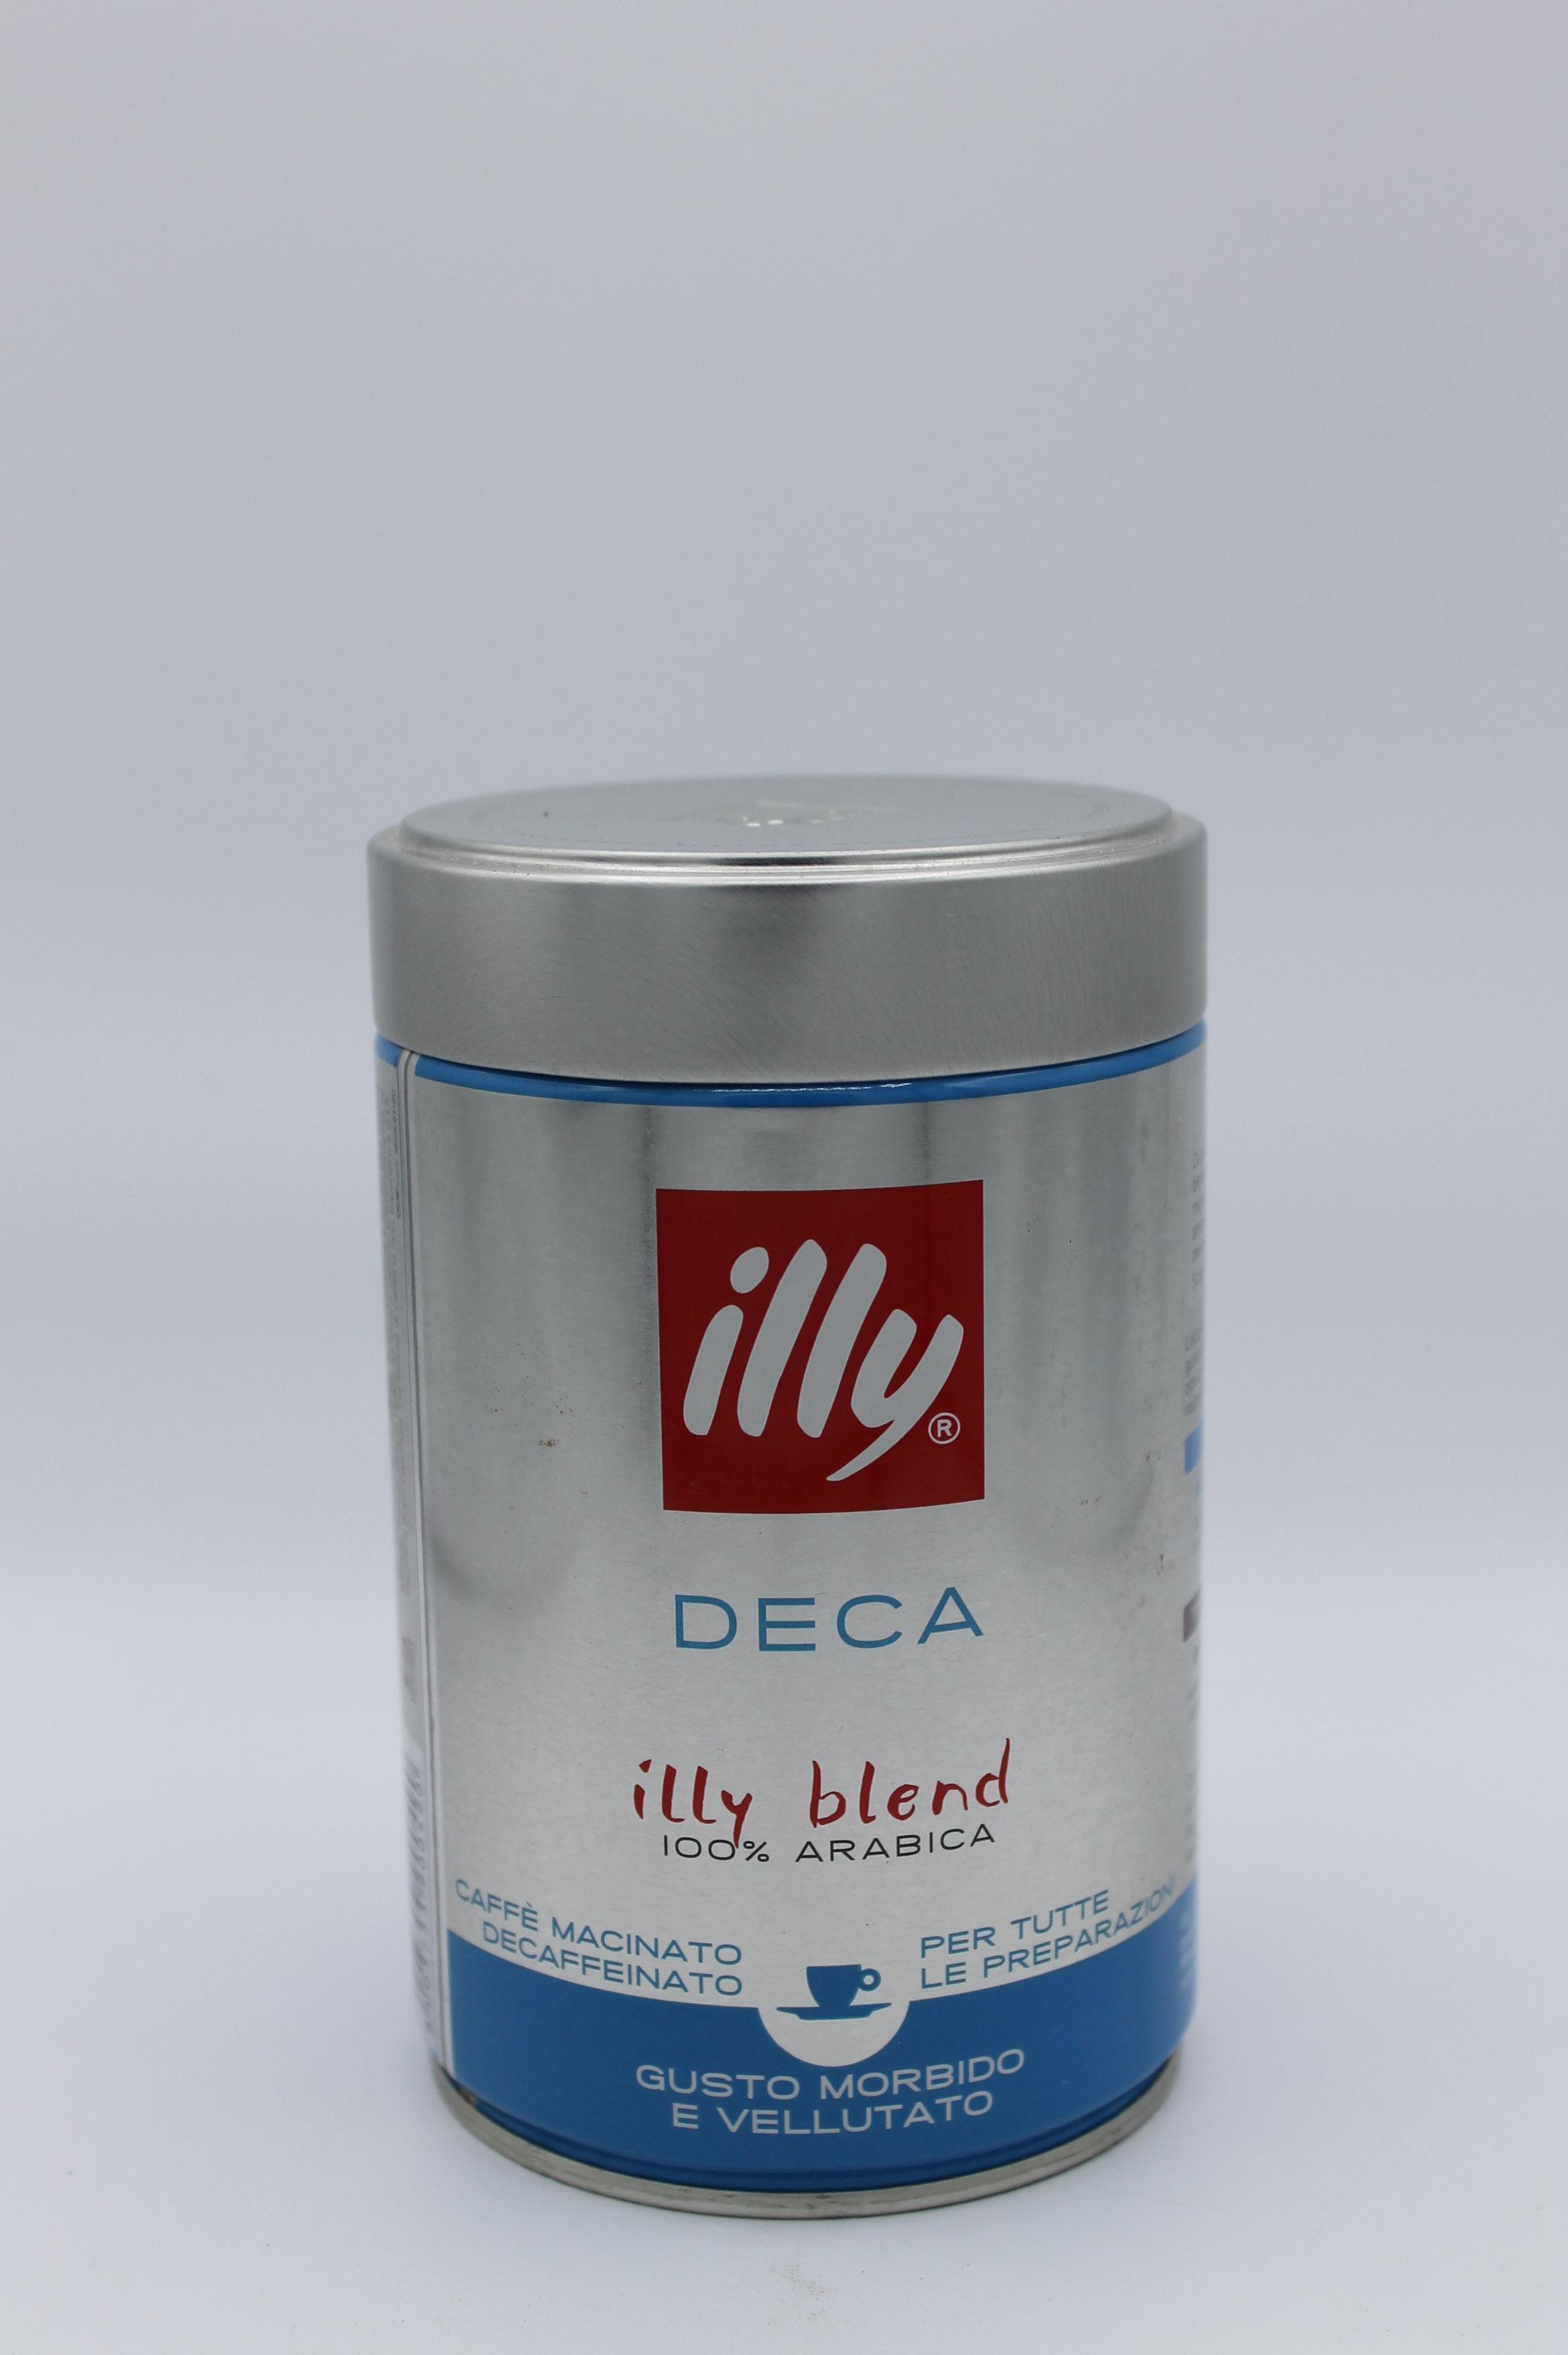 Illy decaffeinato 250 gr.